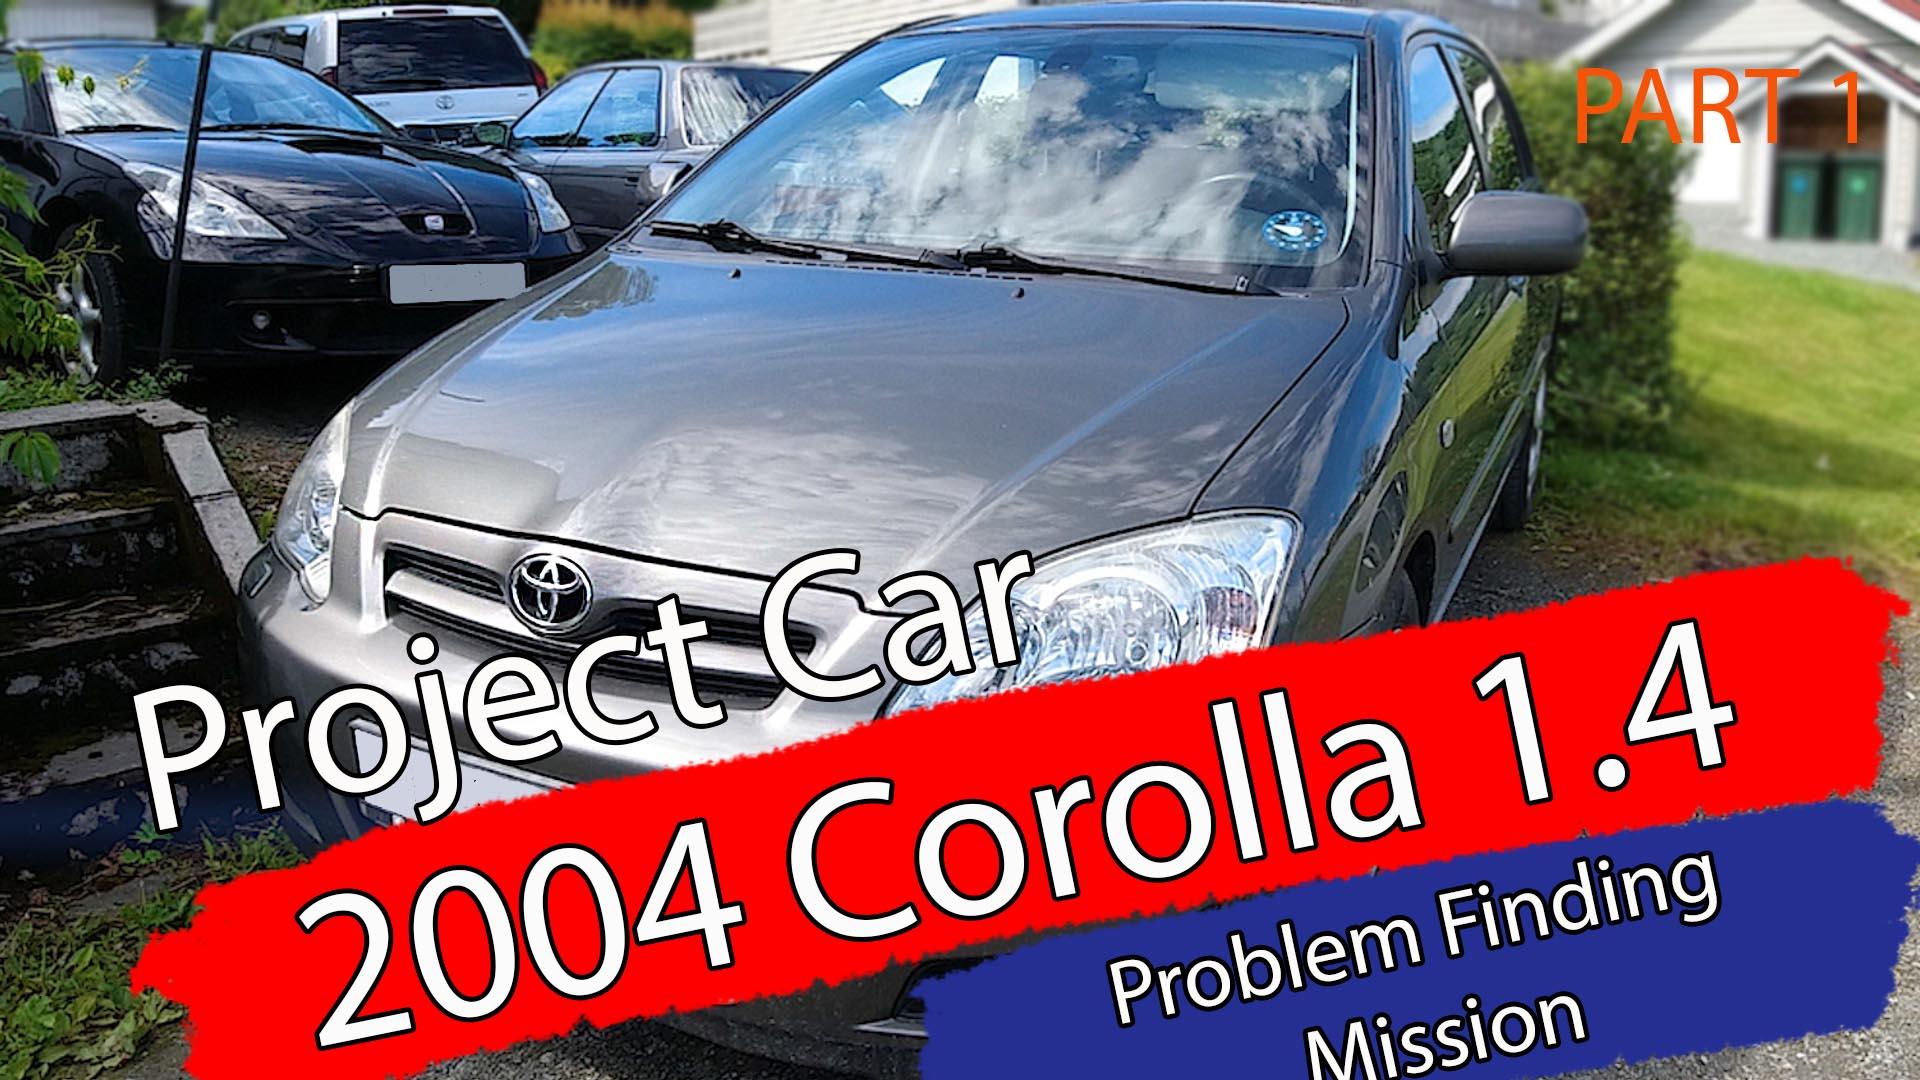 New Project car: 2004 Toyota Corolla